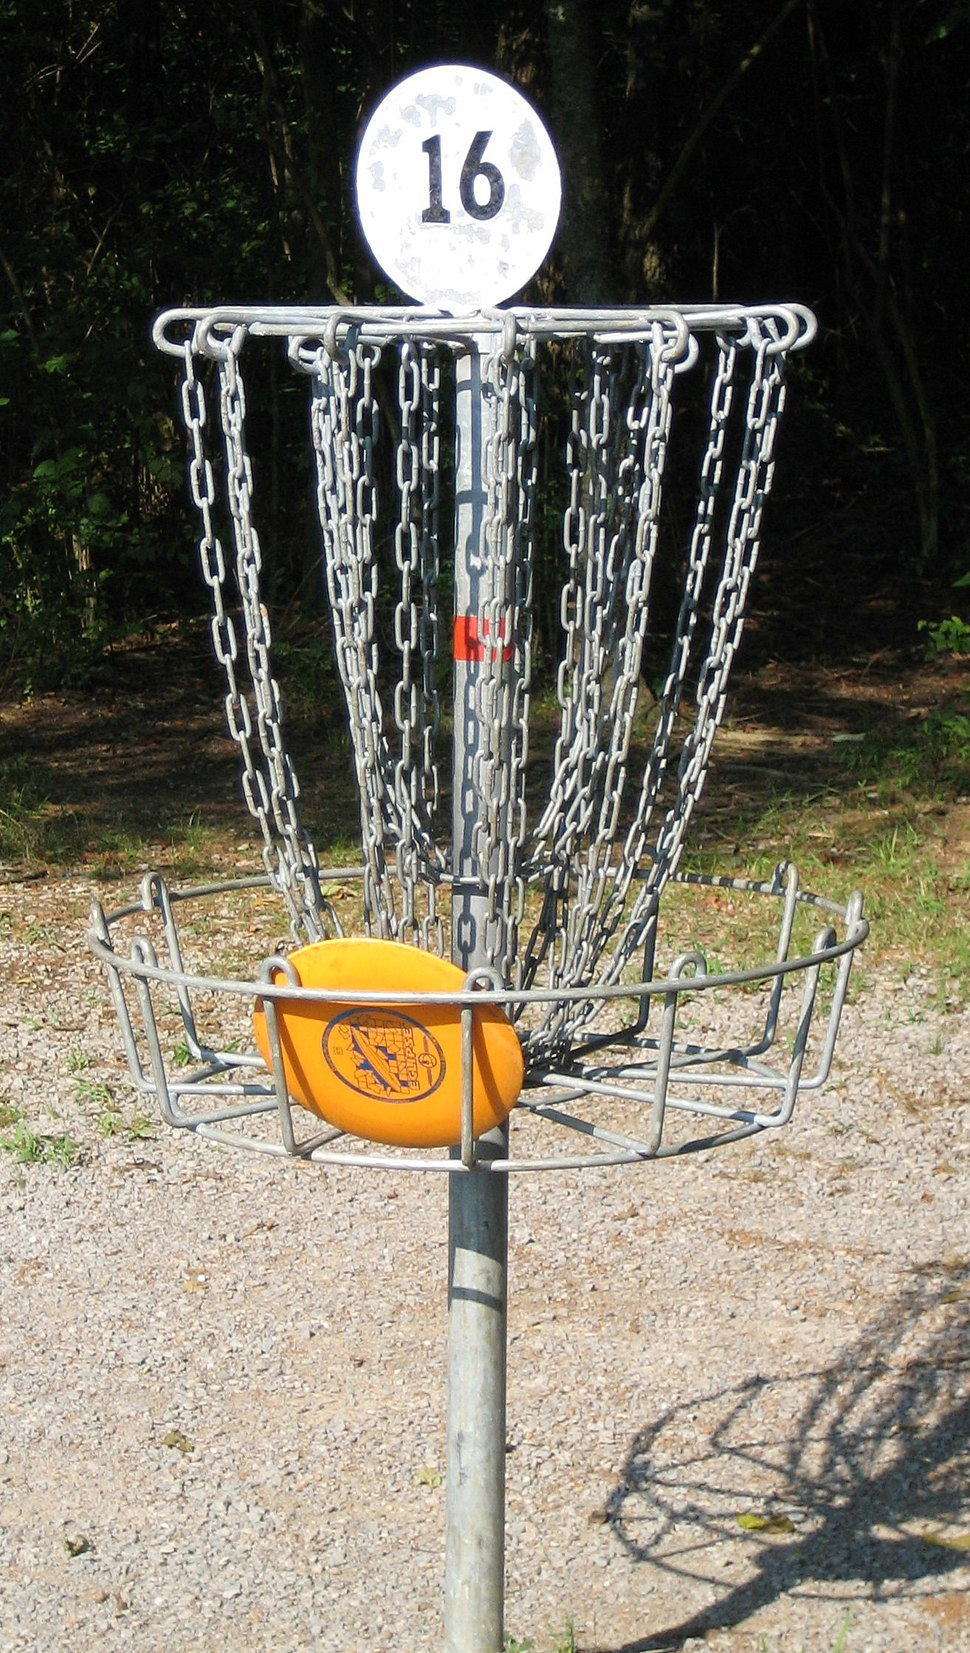 Disc golf in basket